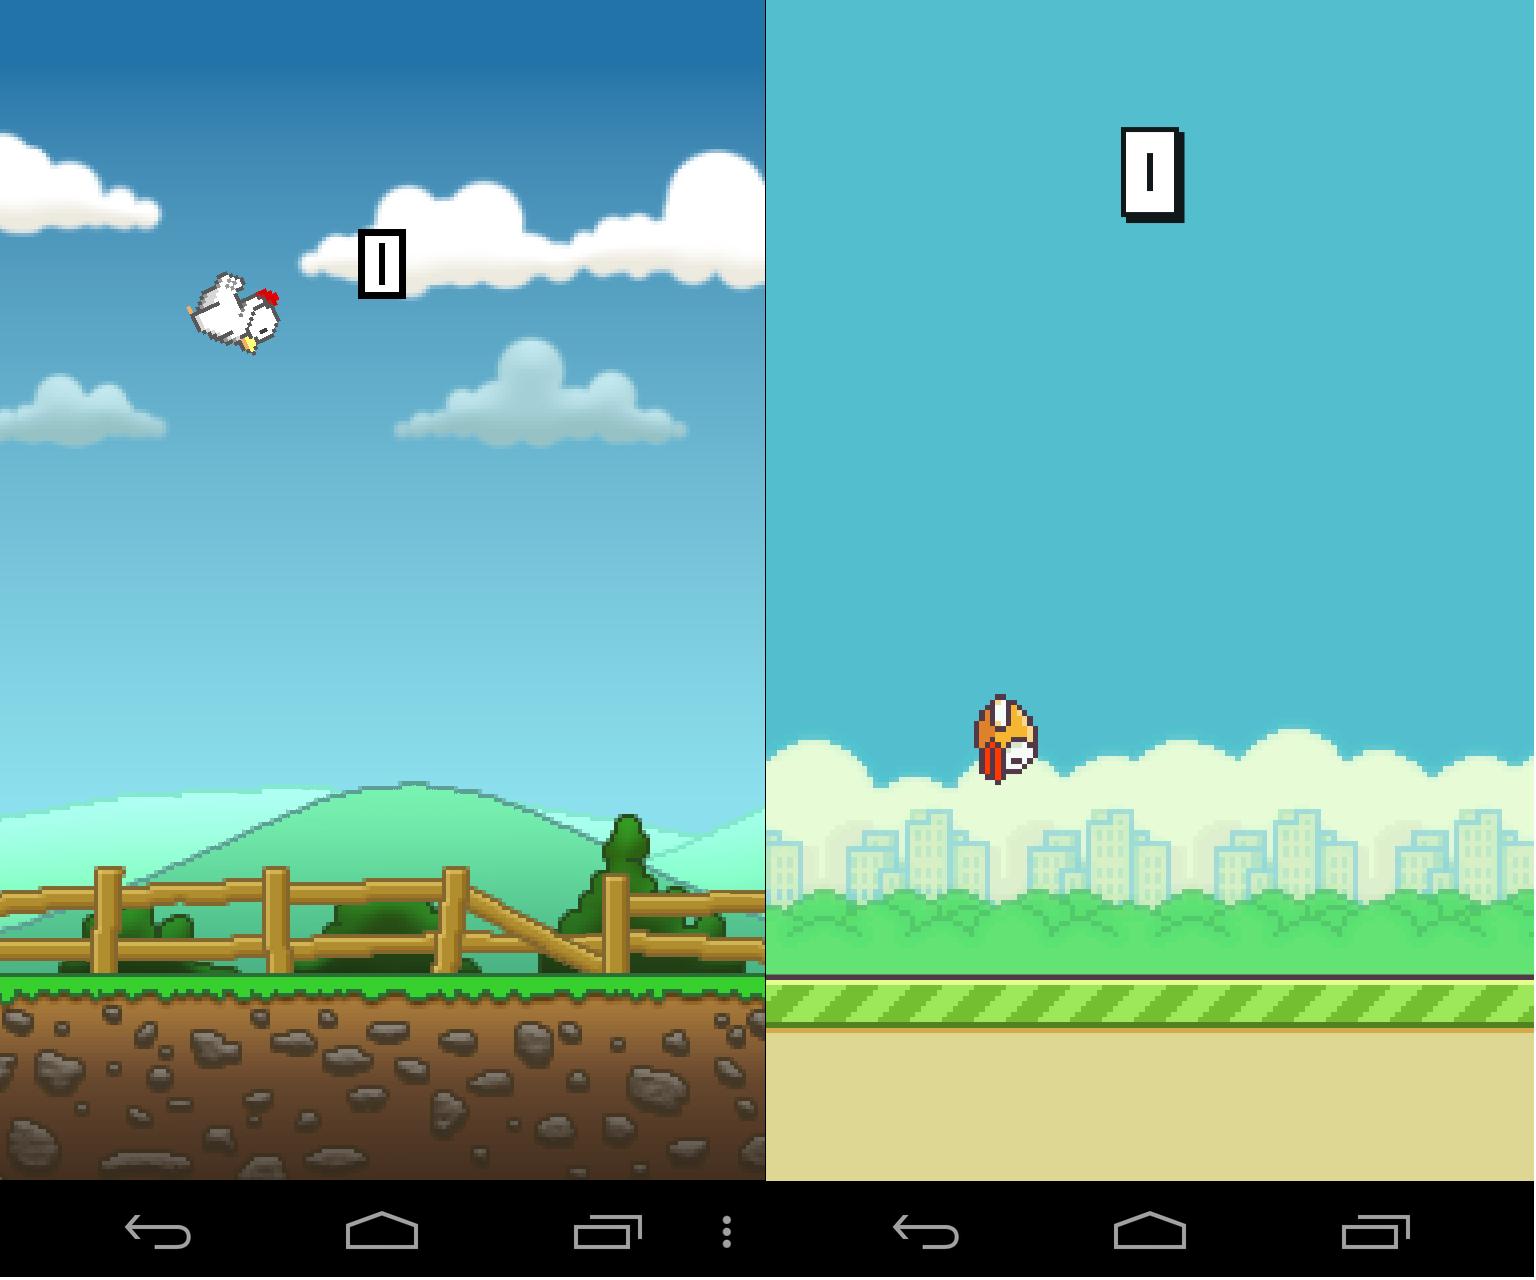 Meet Tappy Chicken, the Flappy Bird clone a non-coder made